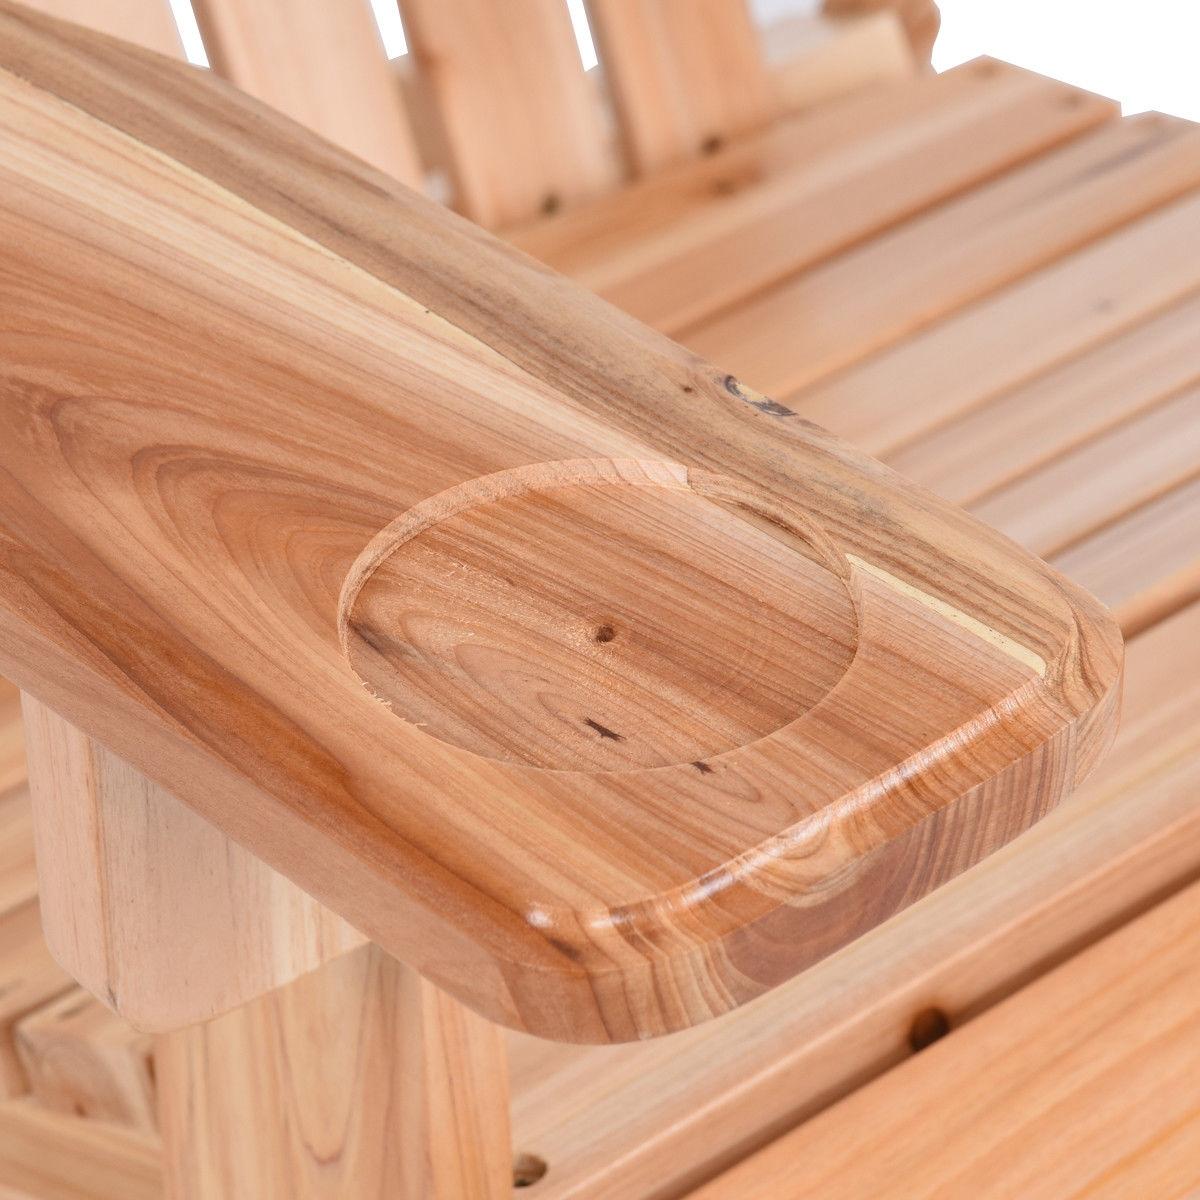 Patio Foldable Wood Adirondack Chair w/ Footrest Stool